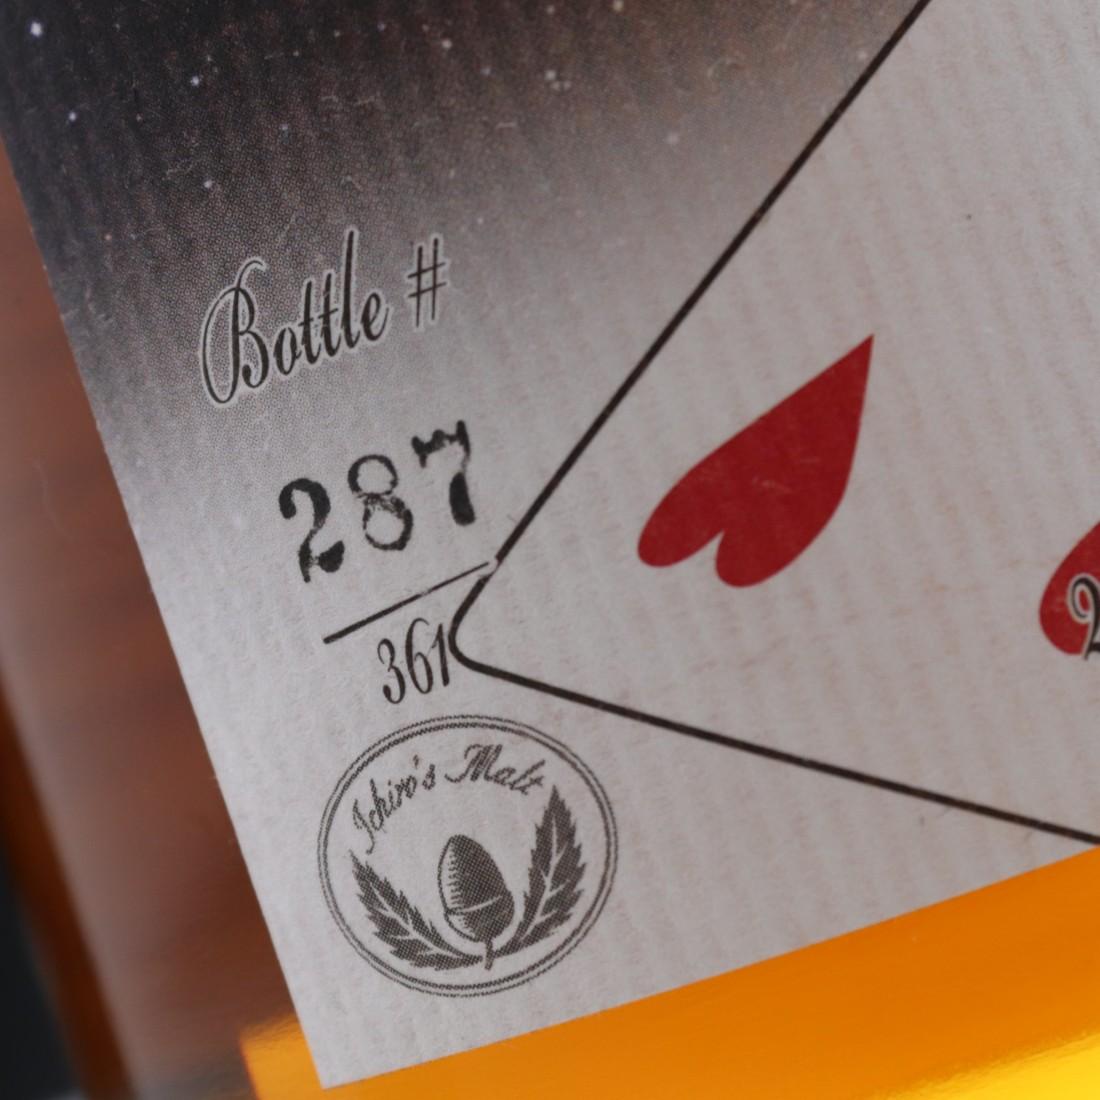 Hanyu 2000 Ichiro's Malt 'Card' #529 / Four of Hearts